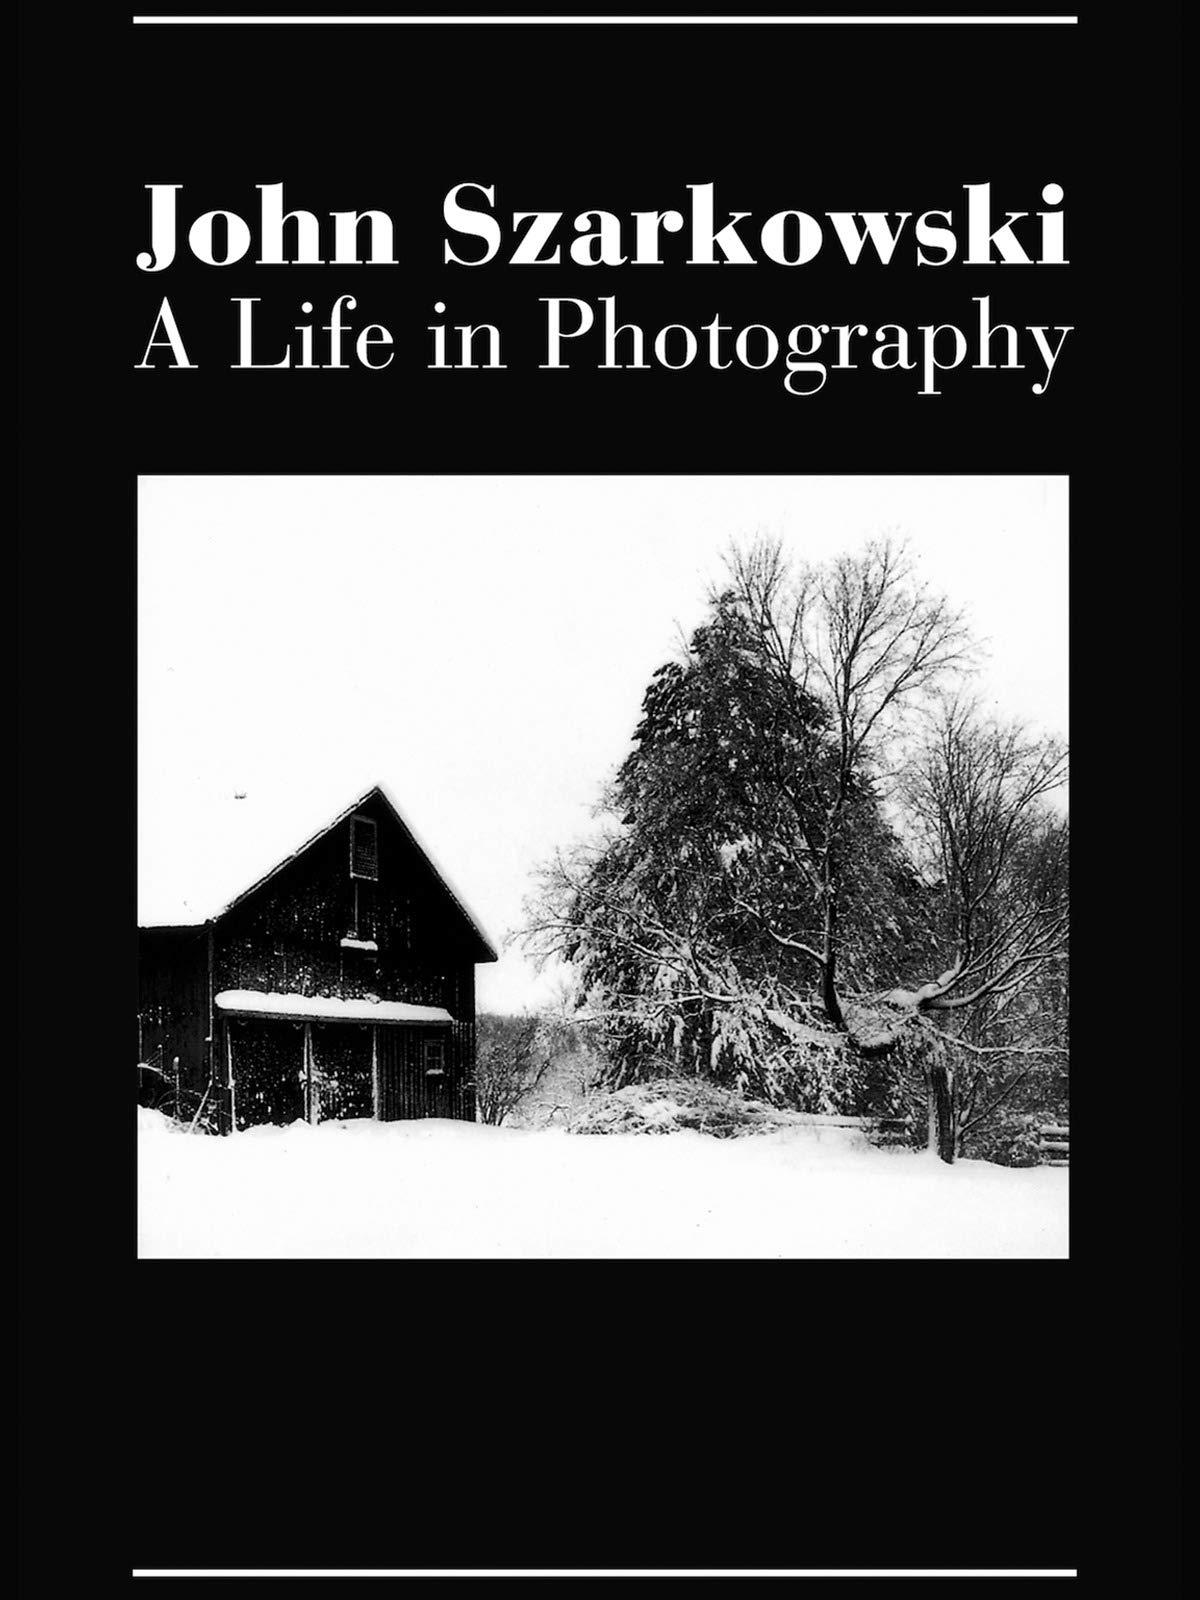 John Szarkowski: A Life in Photography on Amazon Prime Video UK